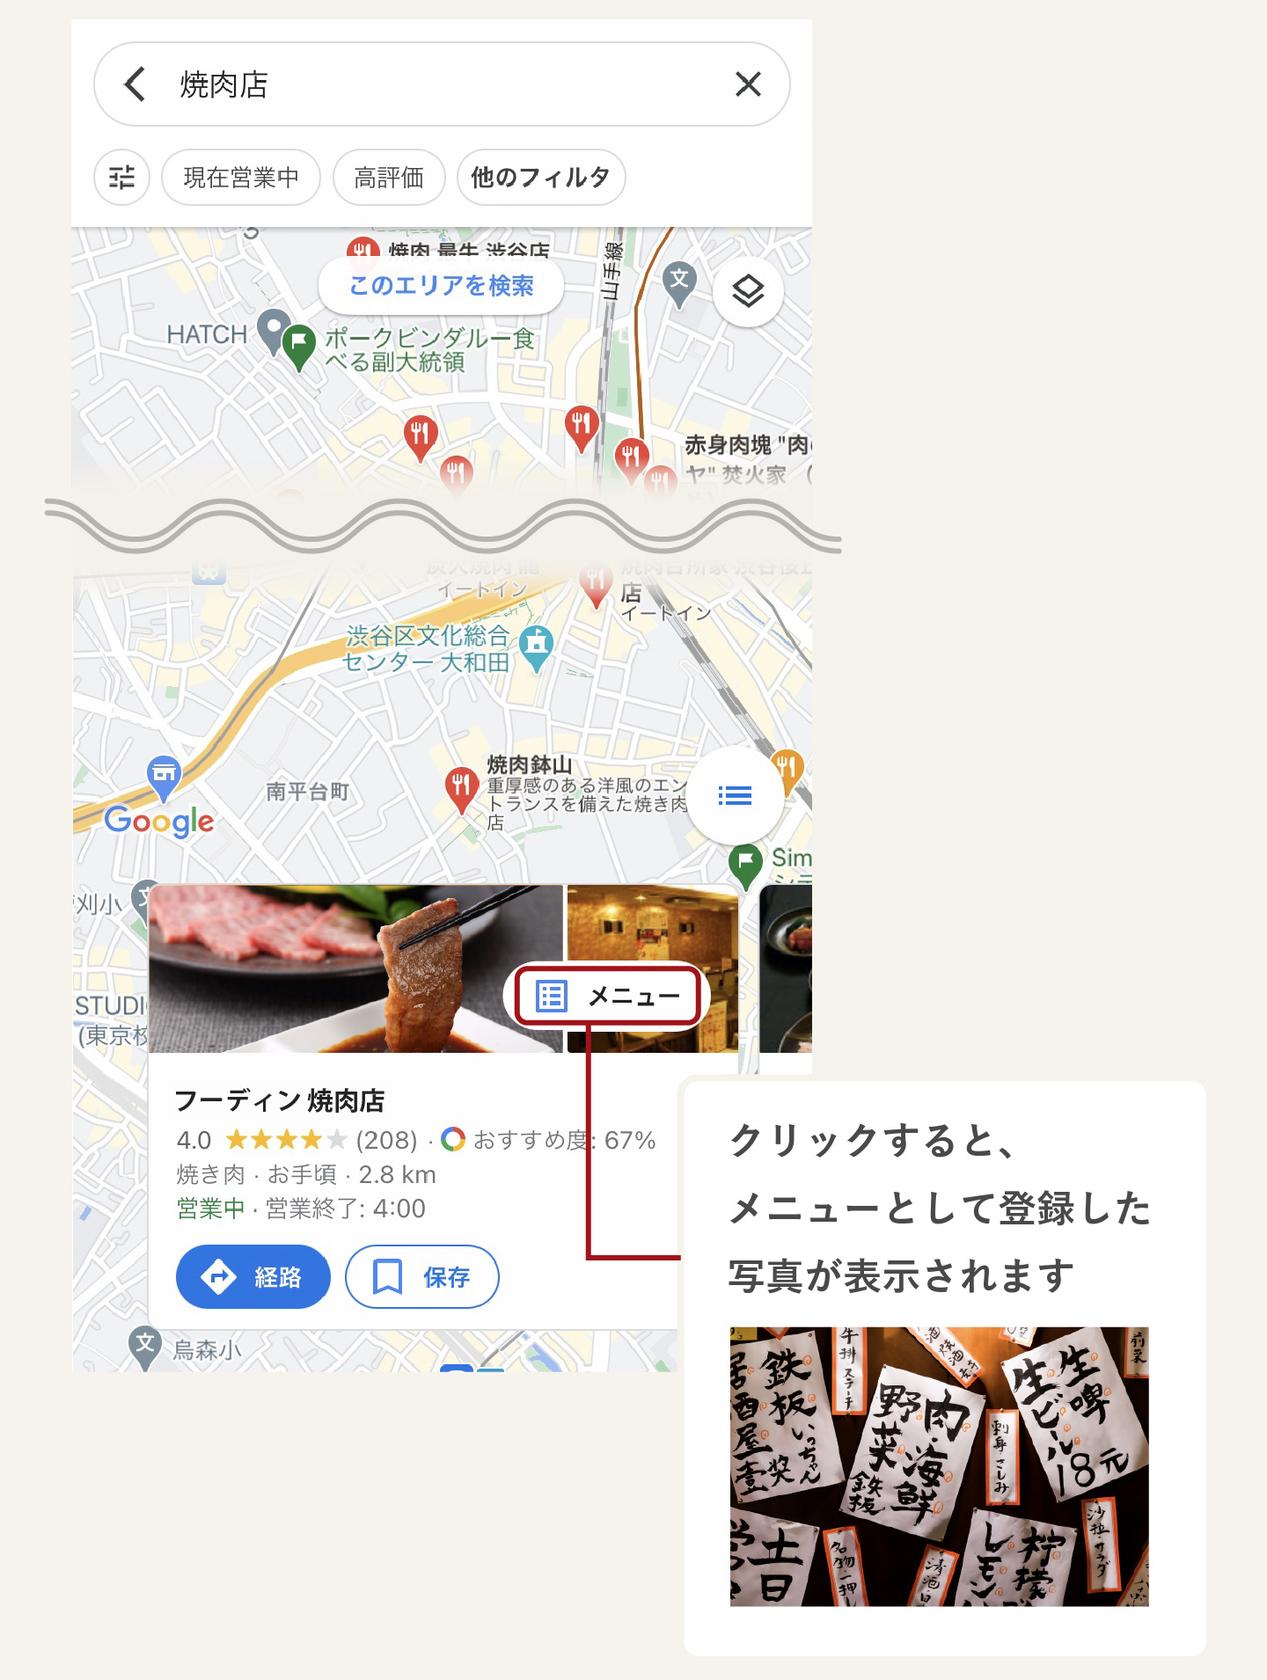 Googleマップ上のメニューボタン